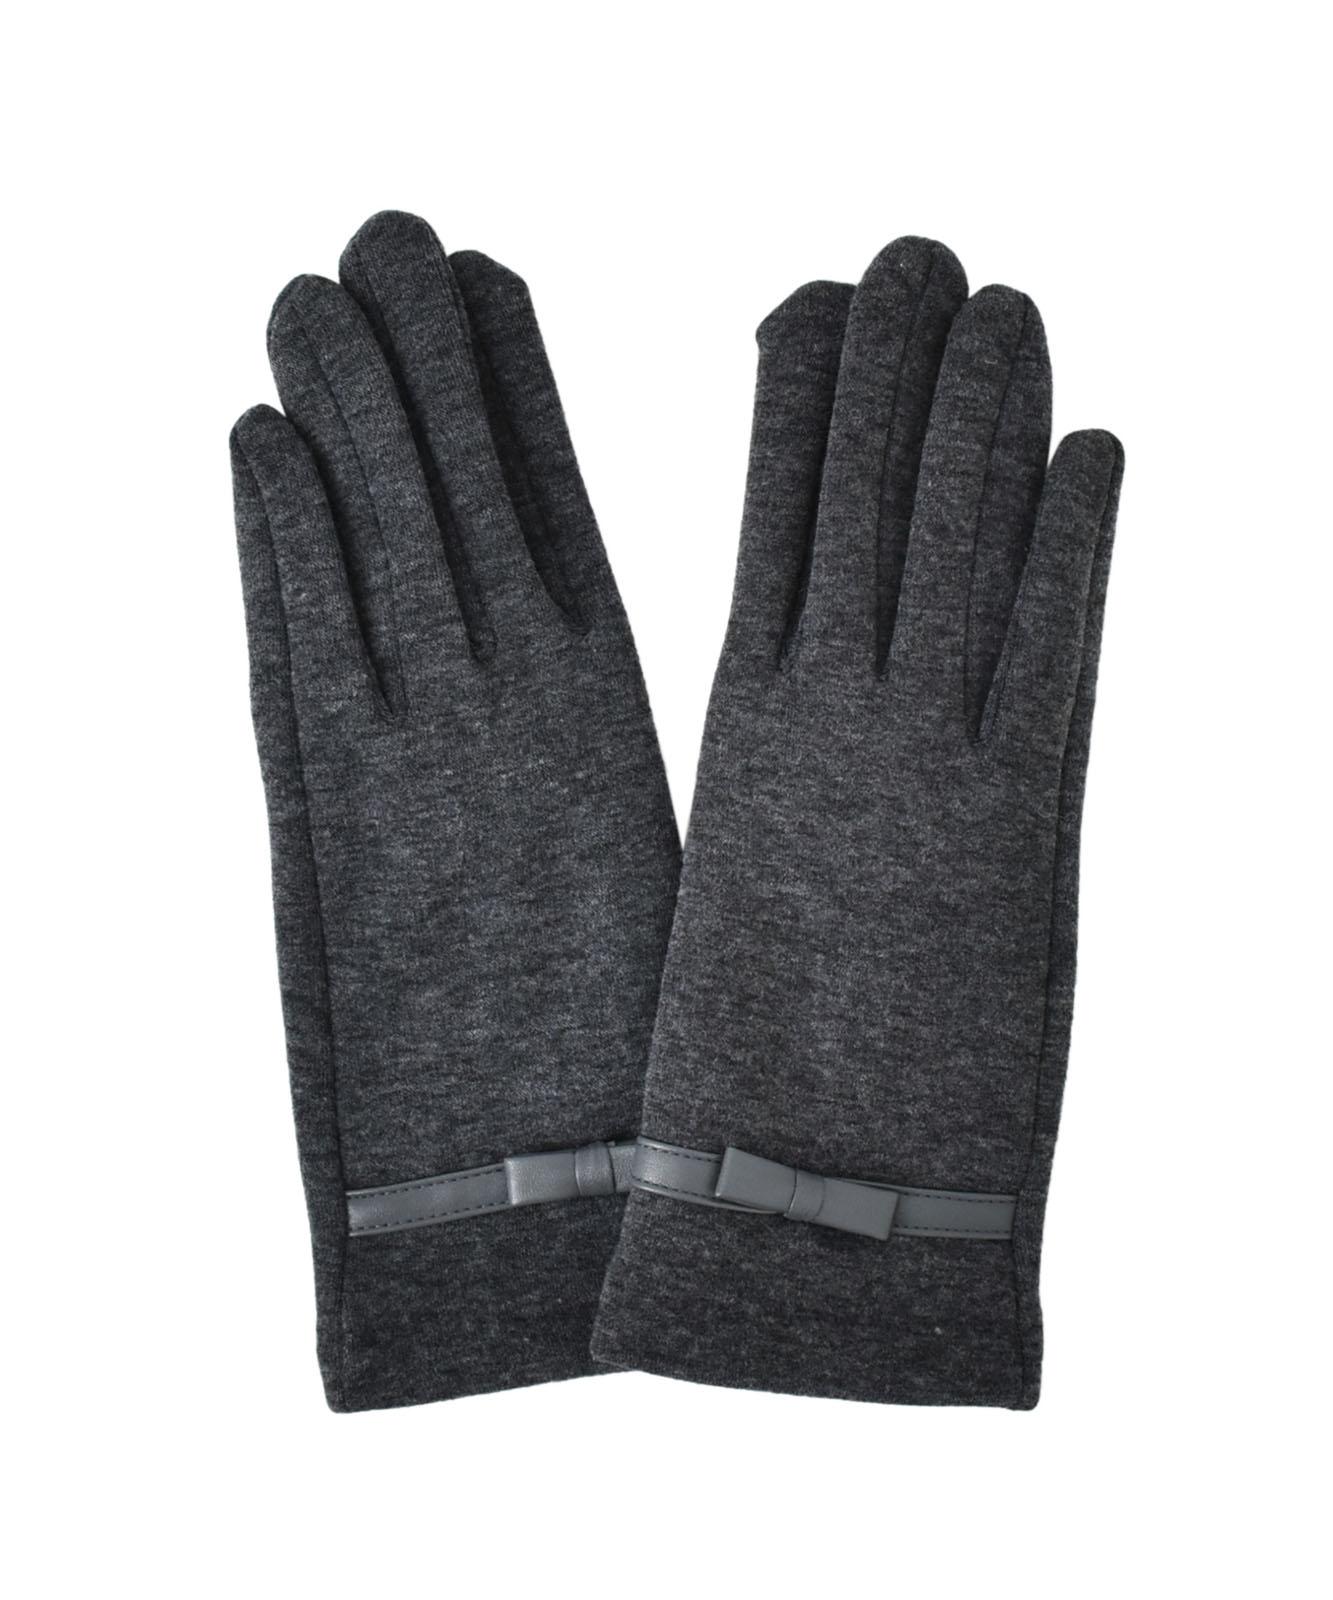 PUリボン付きスマホ対応手袋(抗菌加工)